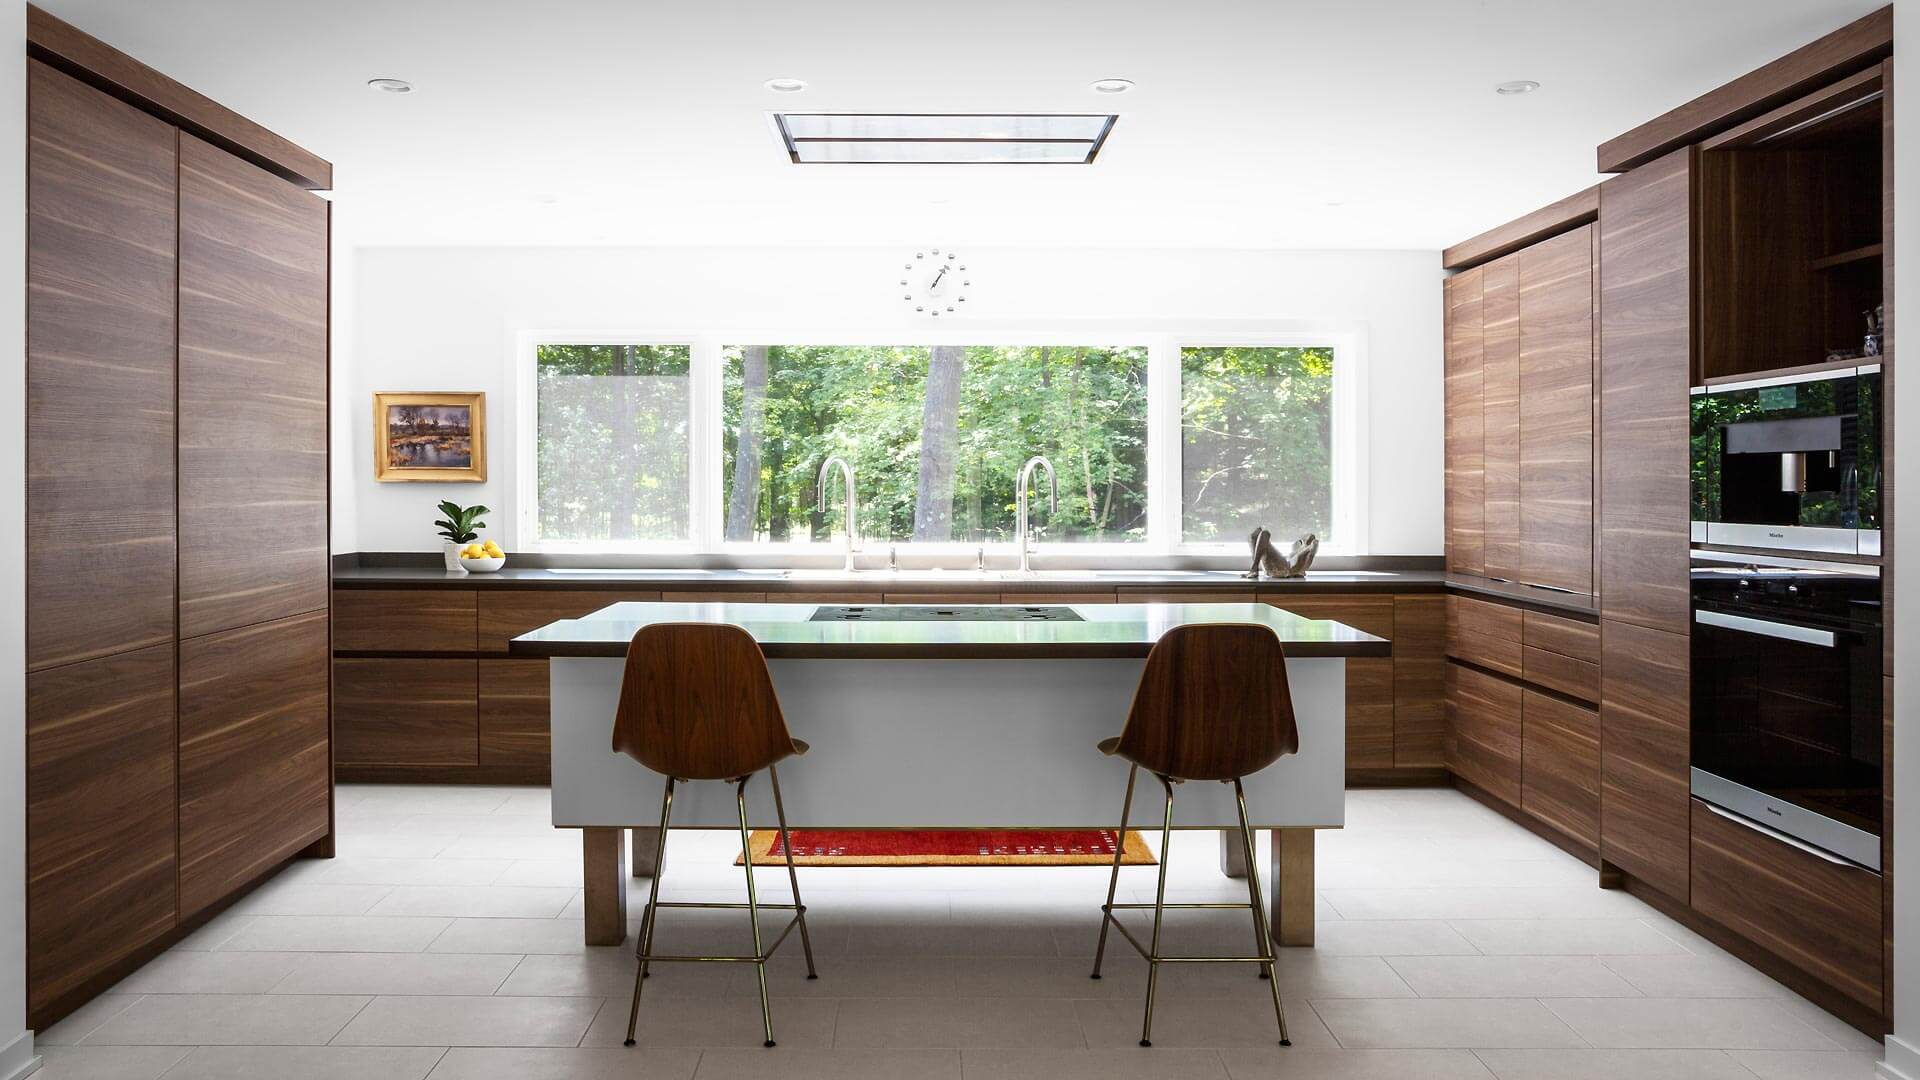 Modern Kitchen Island - Bridge House - Fenneville, Michigan - Lake Michigan